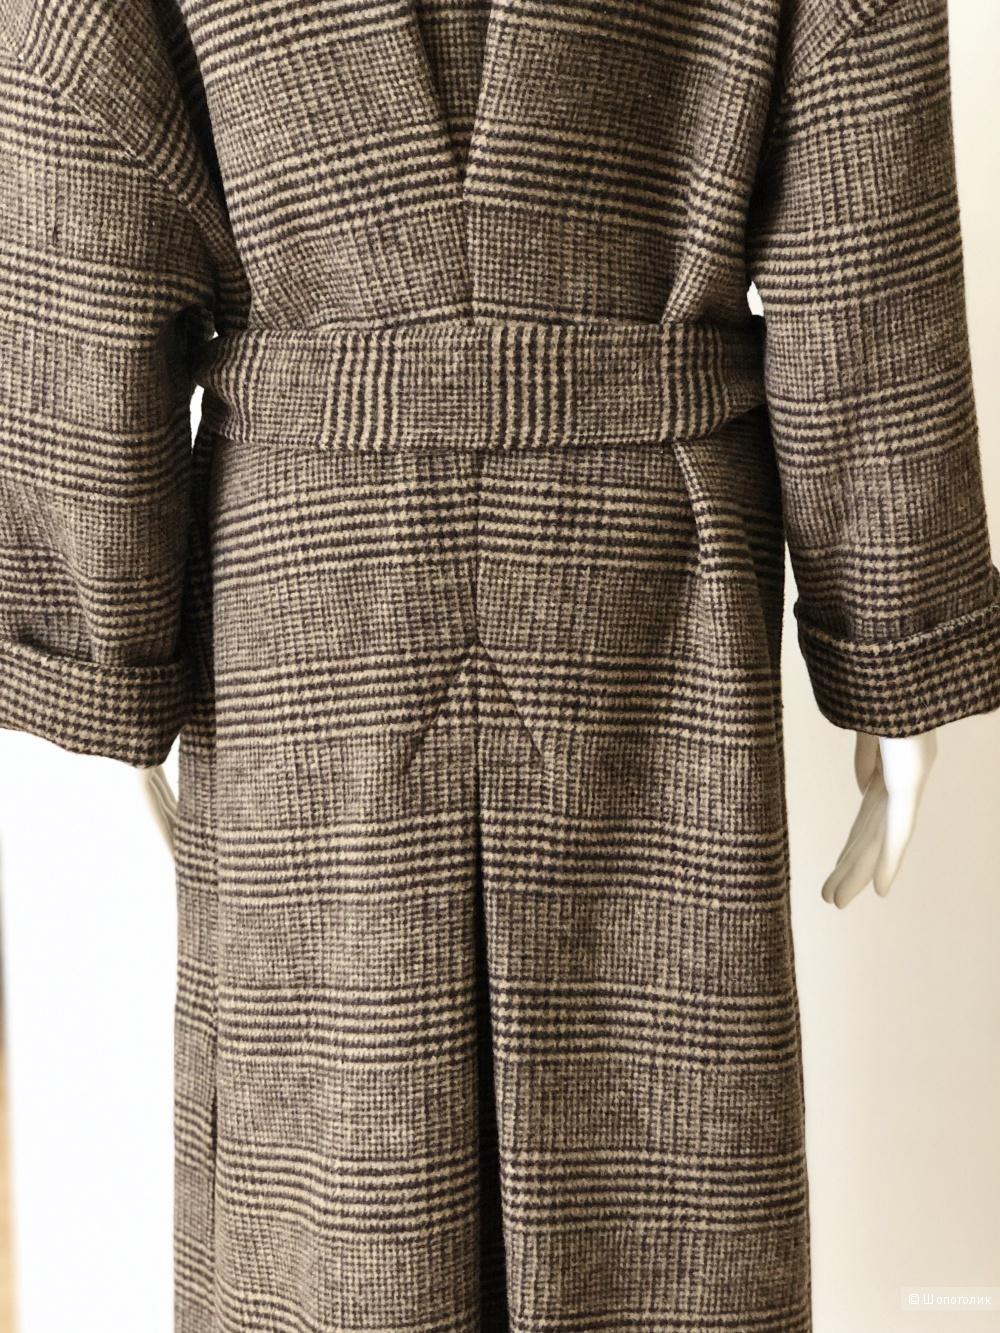 Шерстяное пальто-халат бренда MLS STUDIO, размер free size